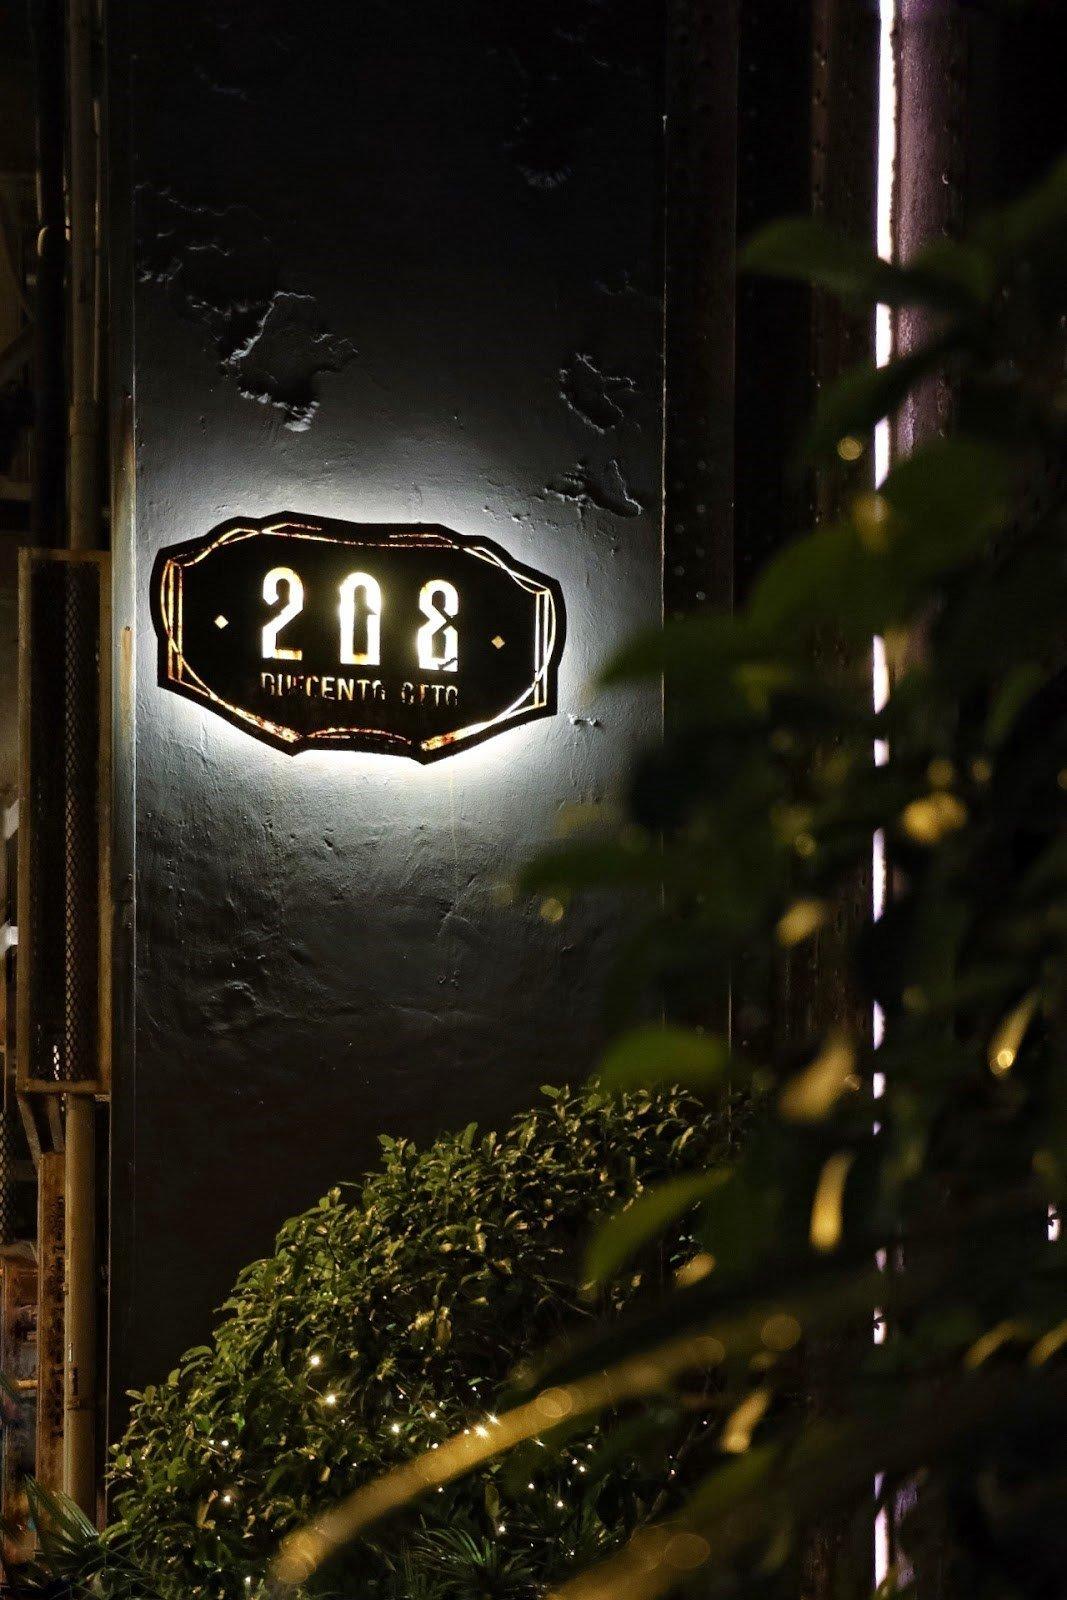 208 Duecento Otto 2